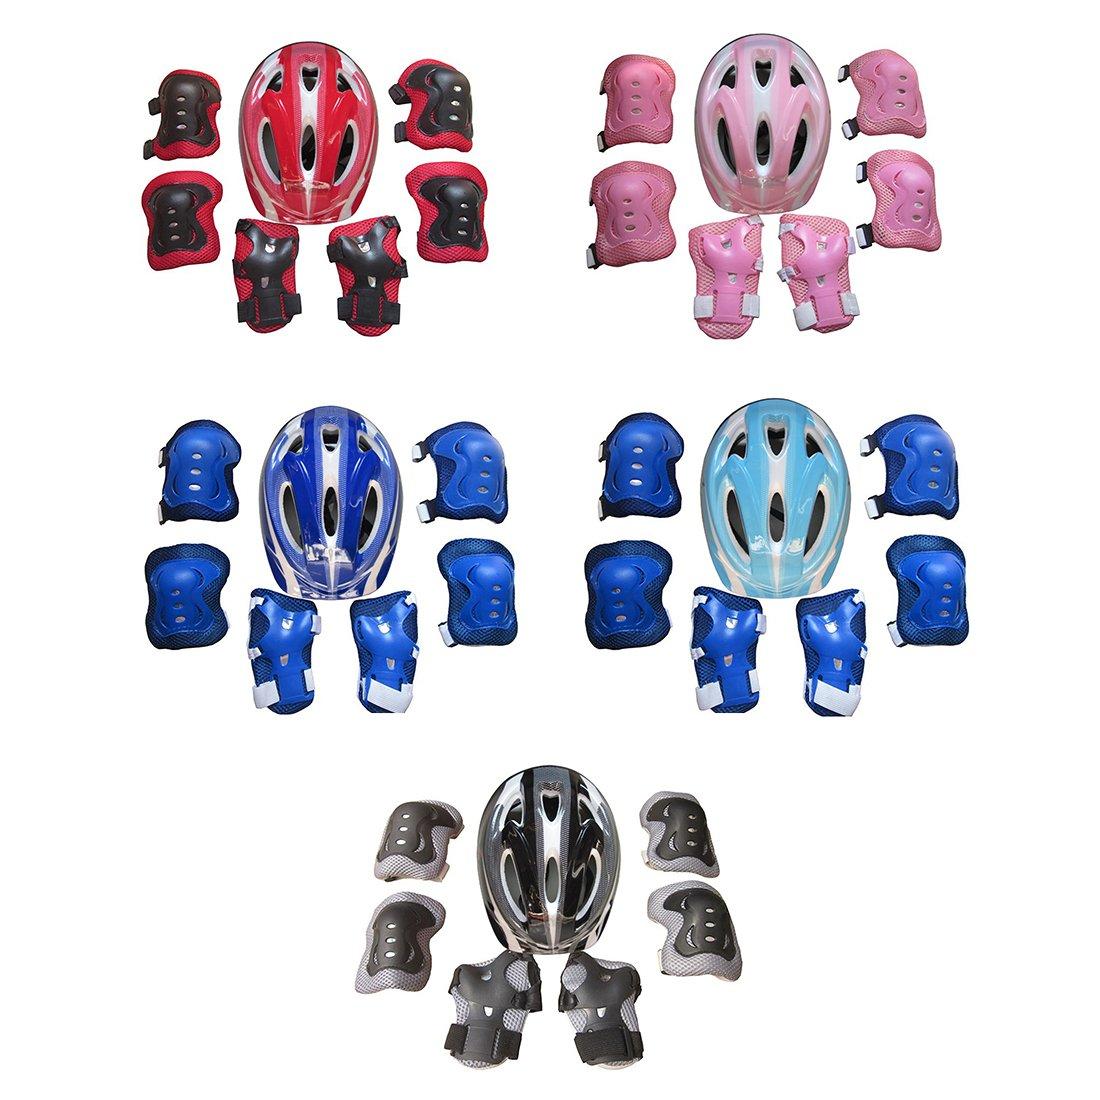 Bicicleta MAJOZ 7 Piezas Casco y Protecciones Infantil Patinaje Tama/ño Ajustable Casco Rodilleras Coderas Mu/ñequeras para Deportivas Azul Oscuro Skate Monopat/ín